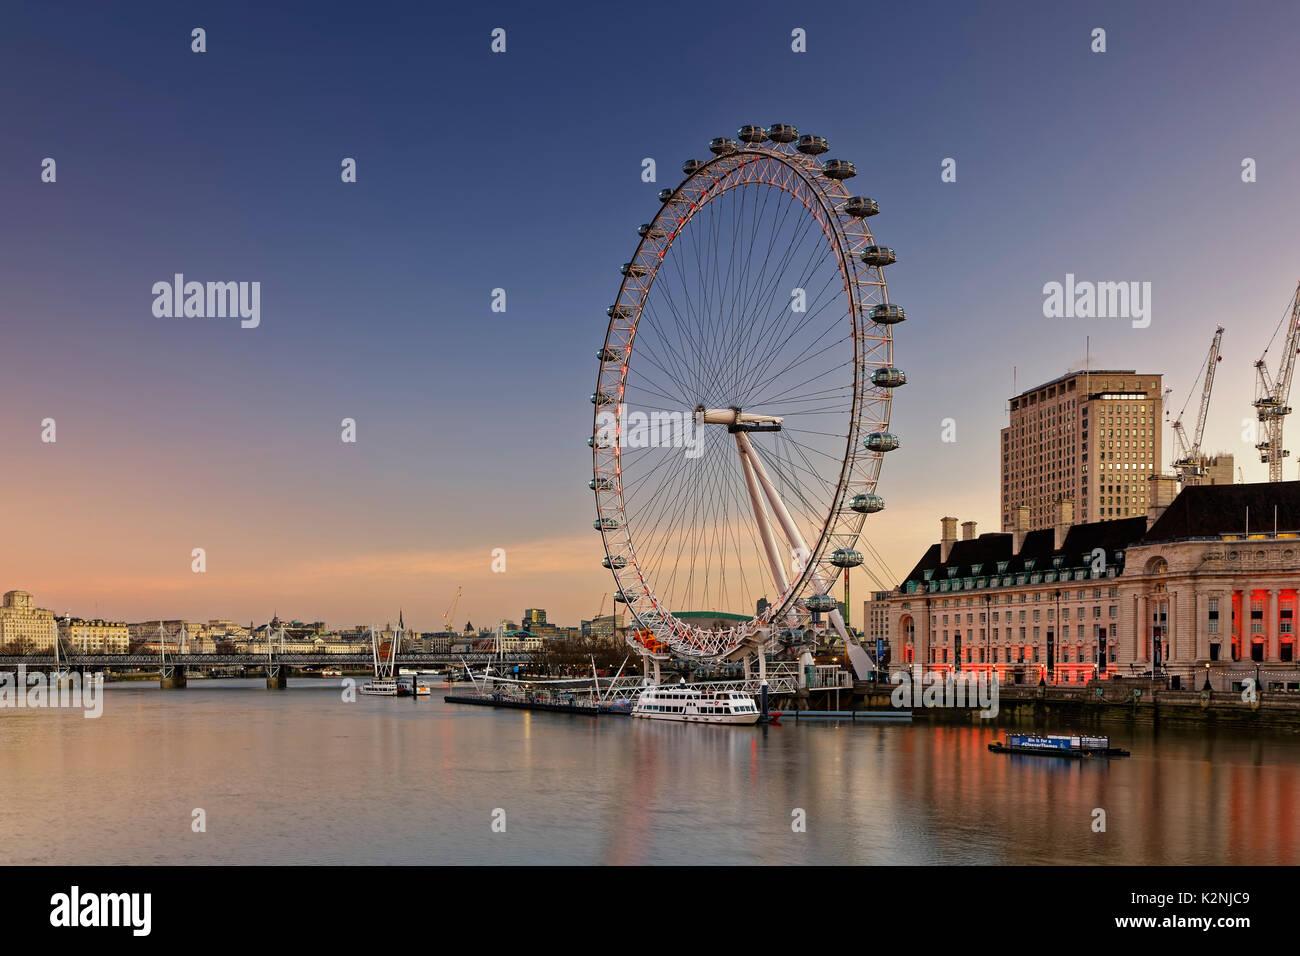 London Eye, Ferris Wheel on the River Thames, London, England, United Kingdom - Stock Image